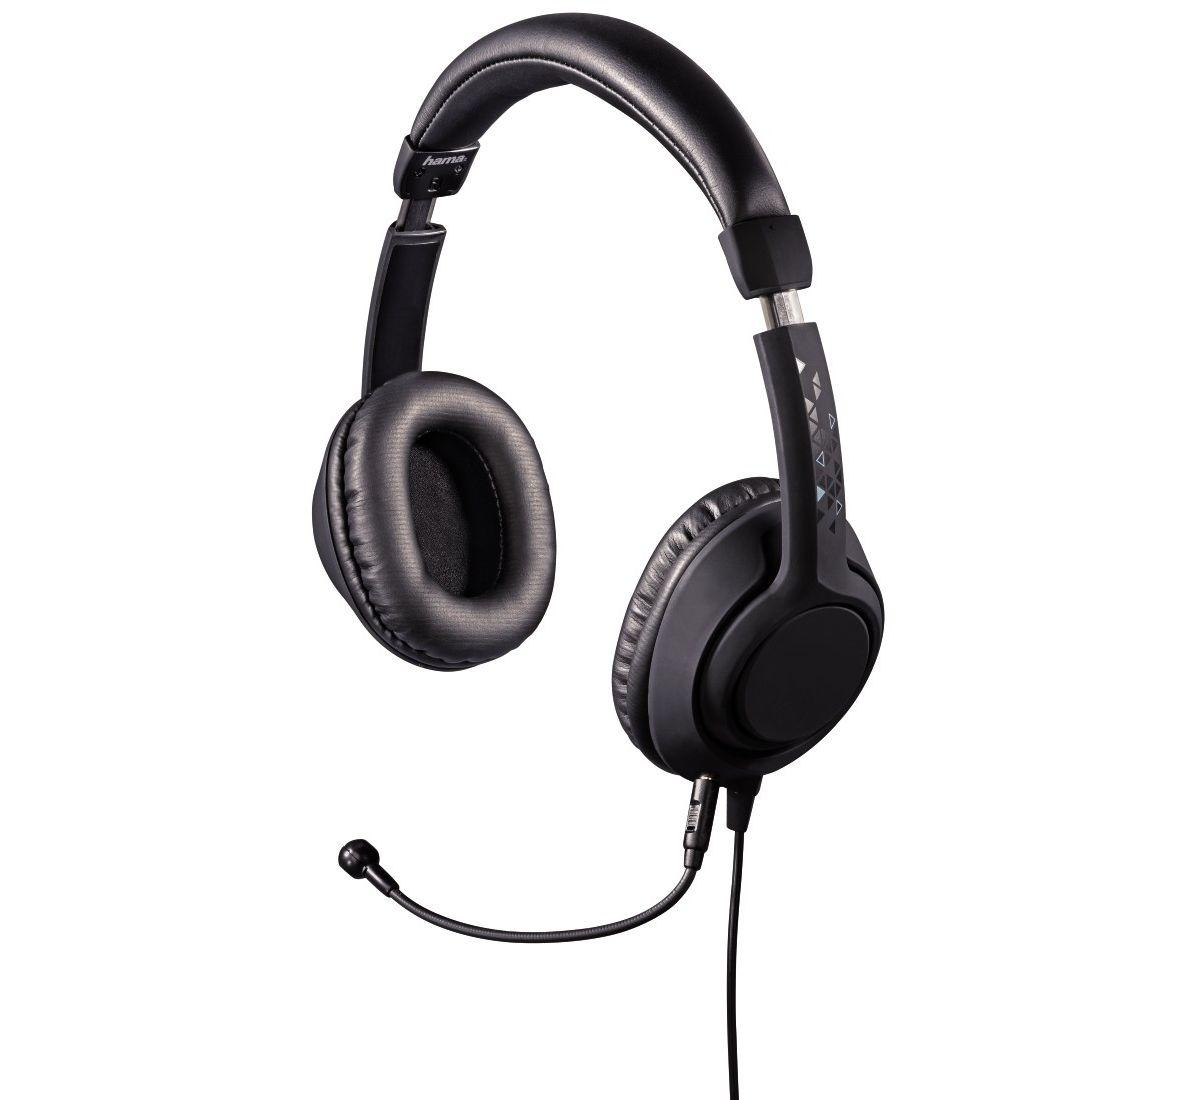 Hama Gaming Headset für PC, Notebook, Tablet, Handy, Konsole »Over-Ear Kopfhörer 1,8 m Kabel«